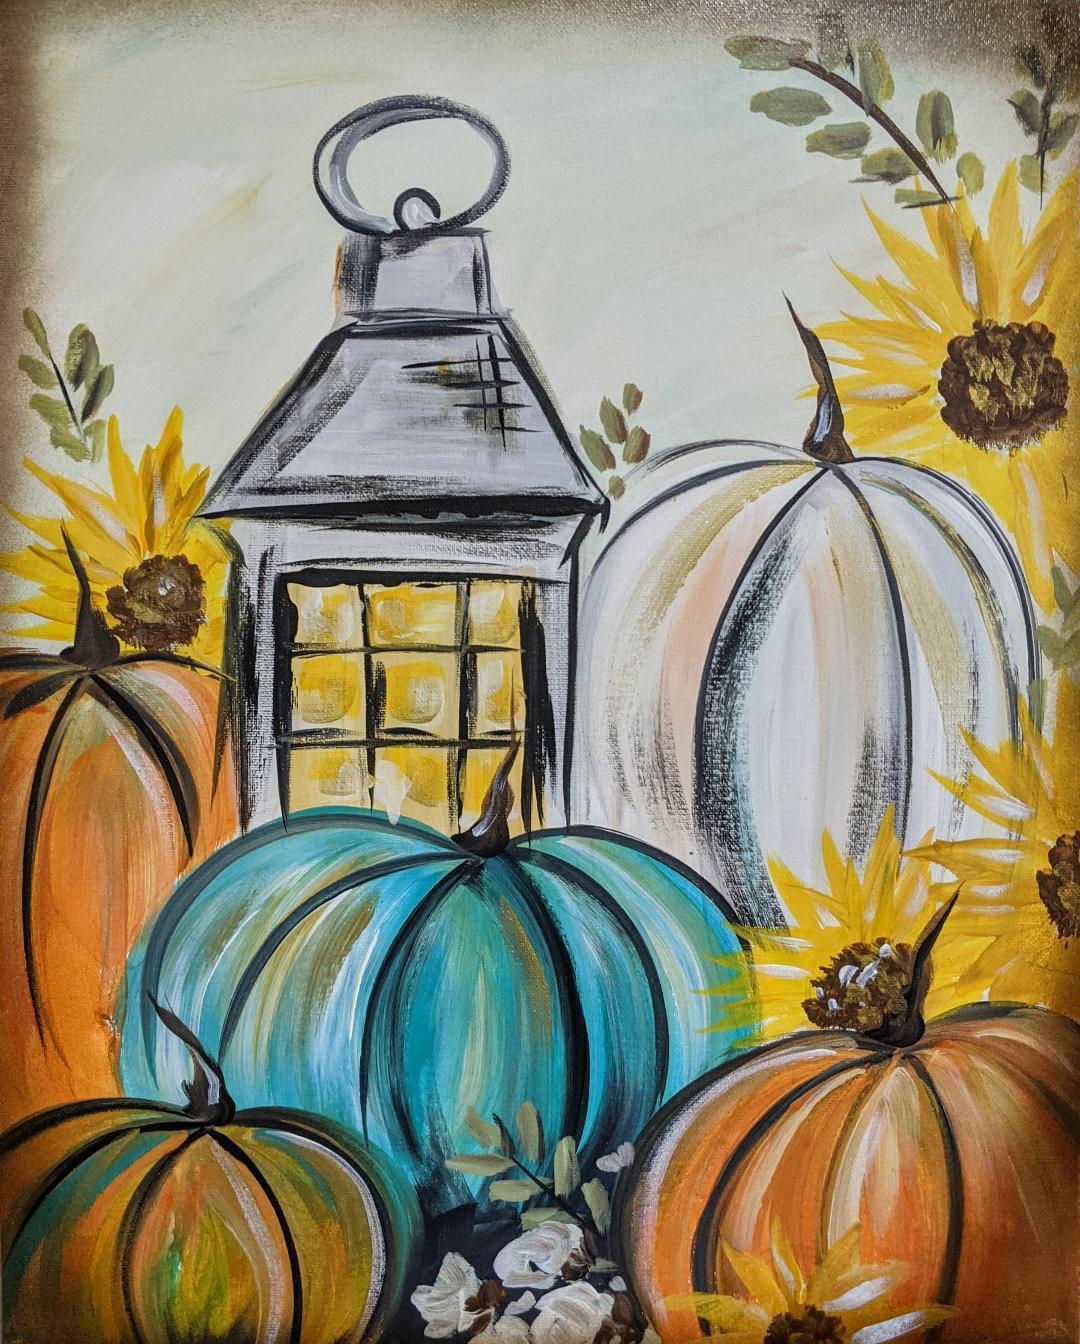 Lantern & Pumpkins